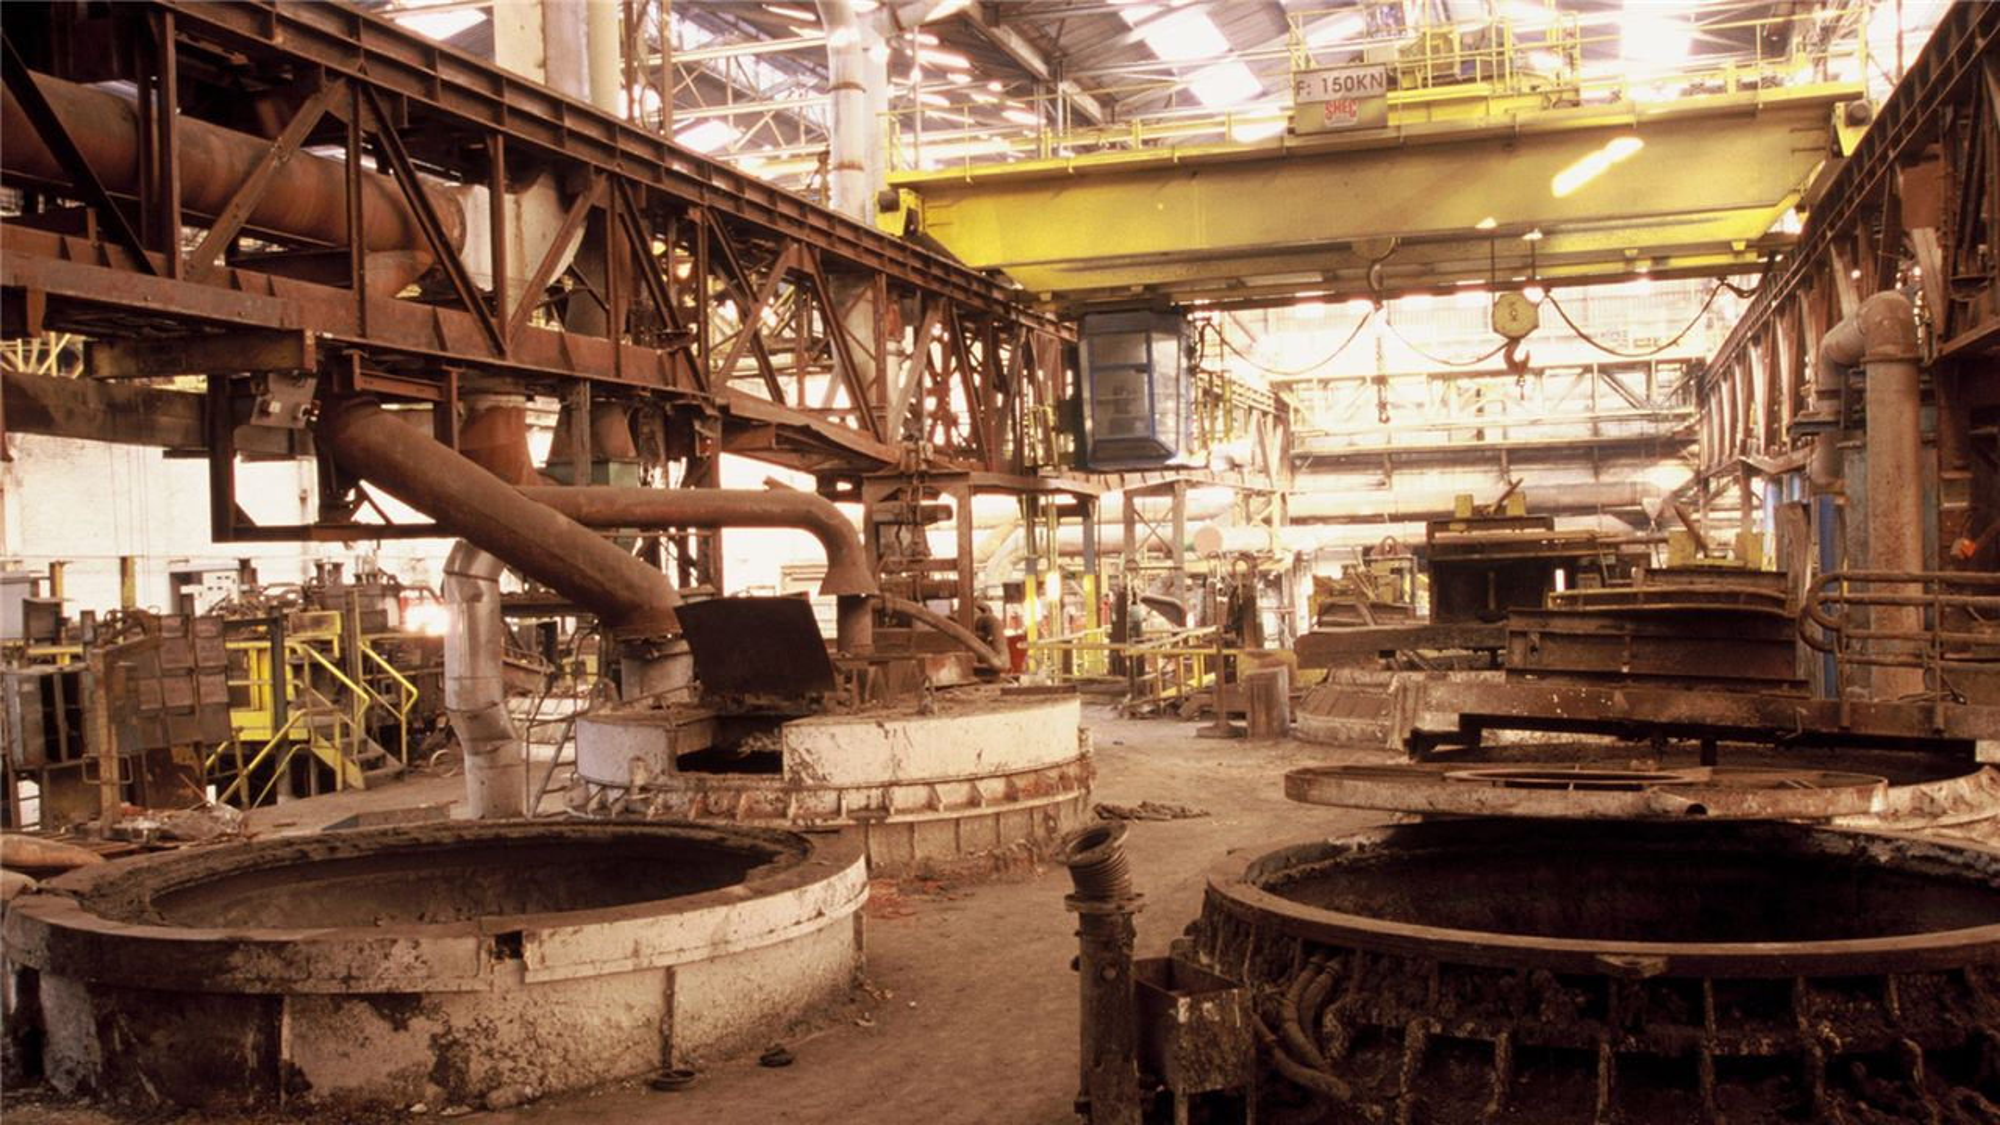 Redevelopment of industrial sites